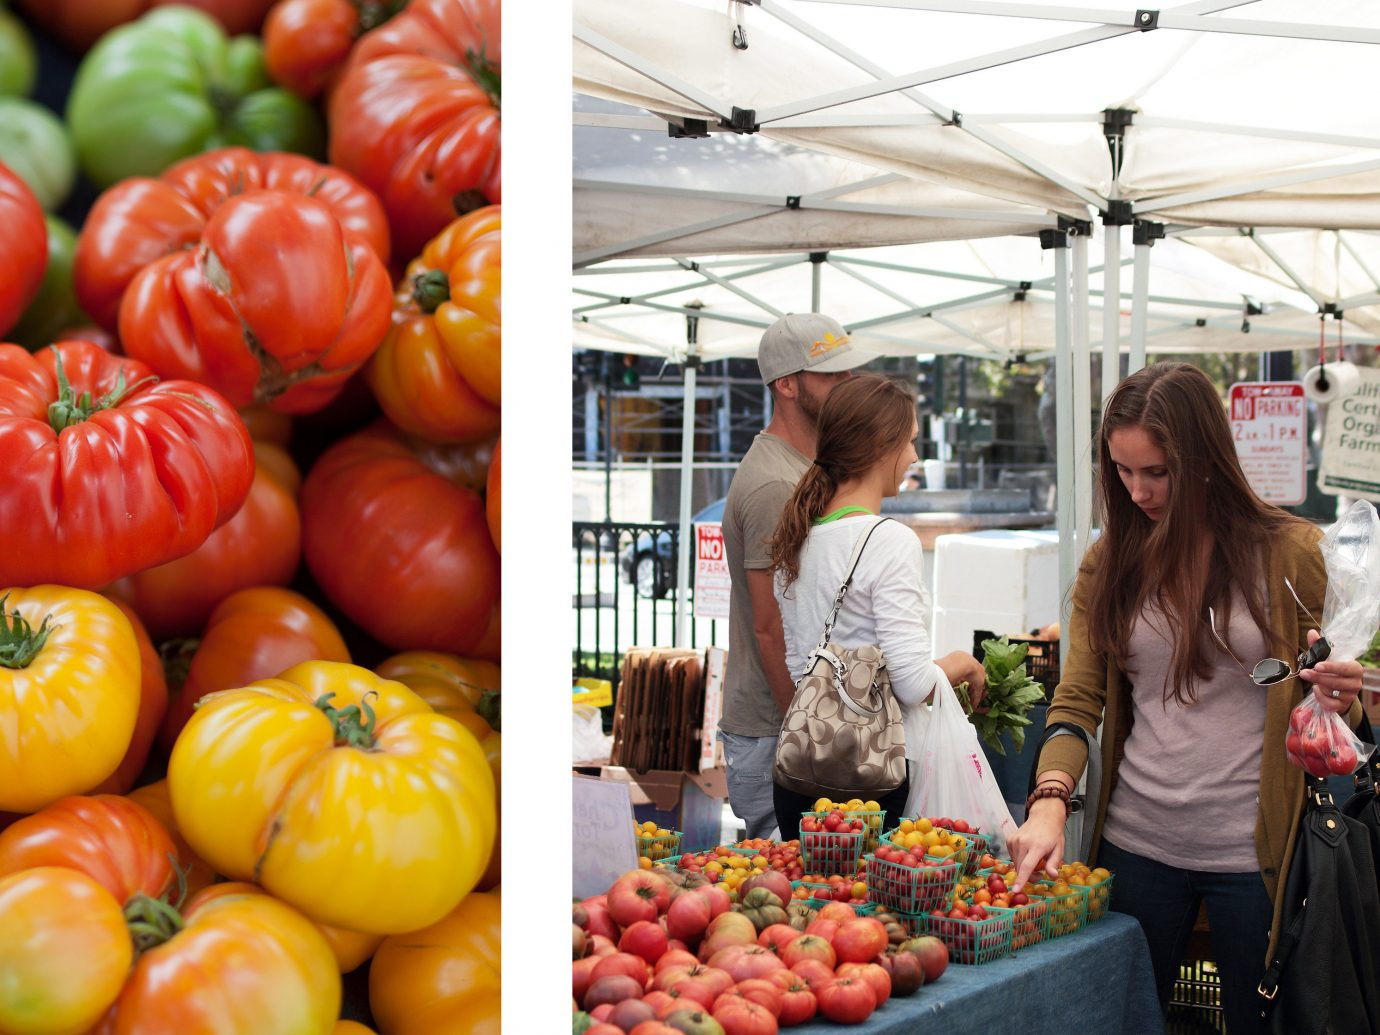 Food + Drink person food woman local food plant public space market produce marketplace vegetable land plant floristry flowering plant flower fruit sale fresh